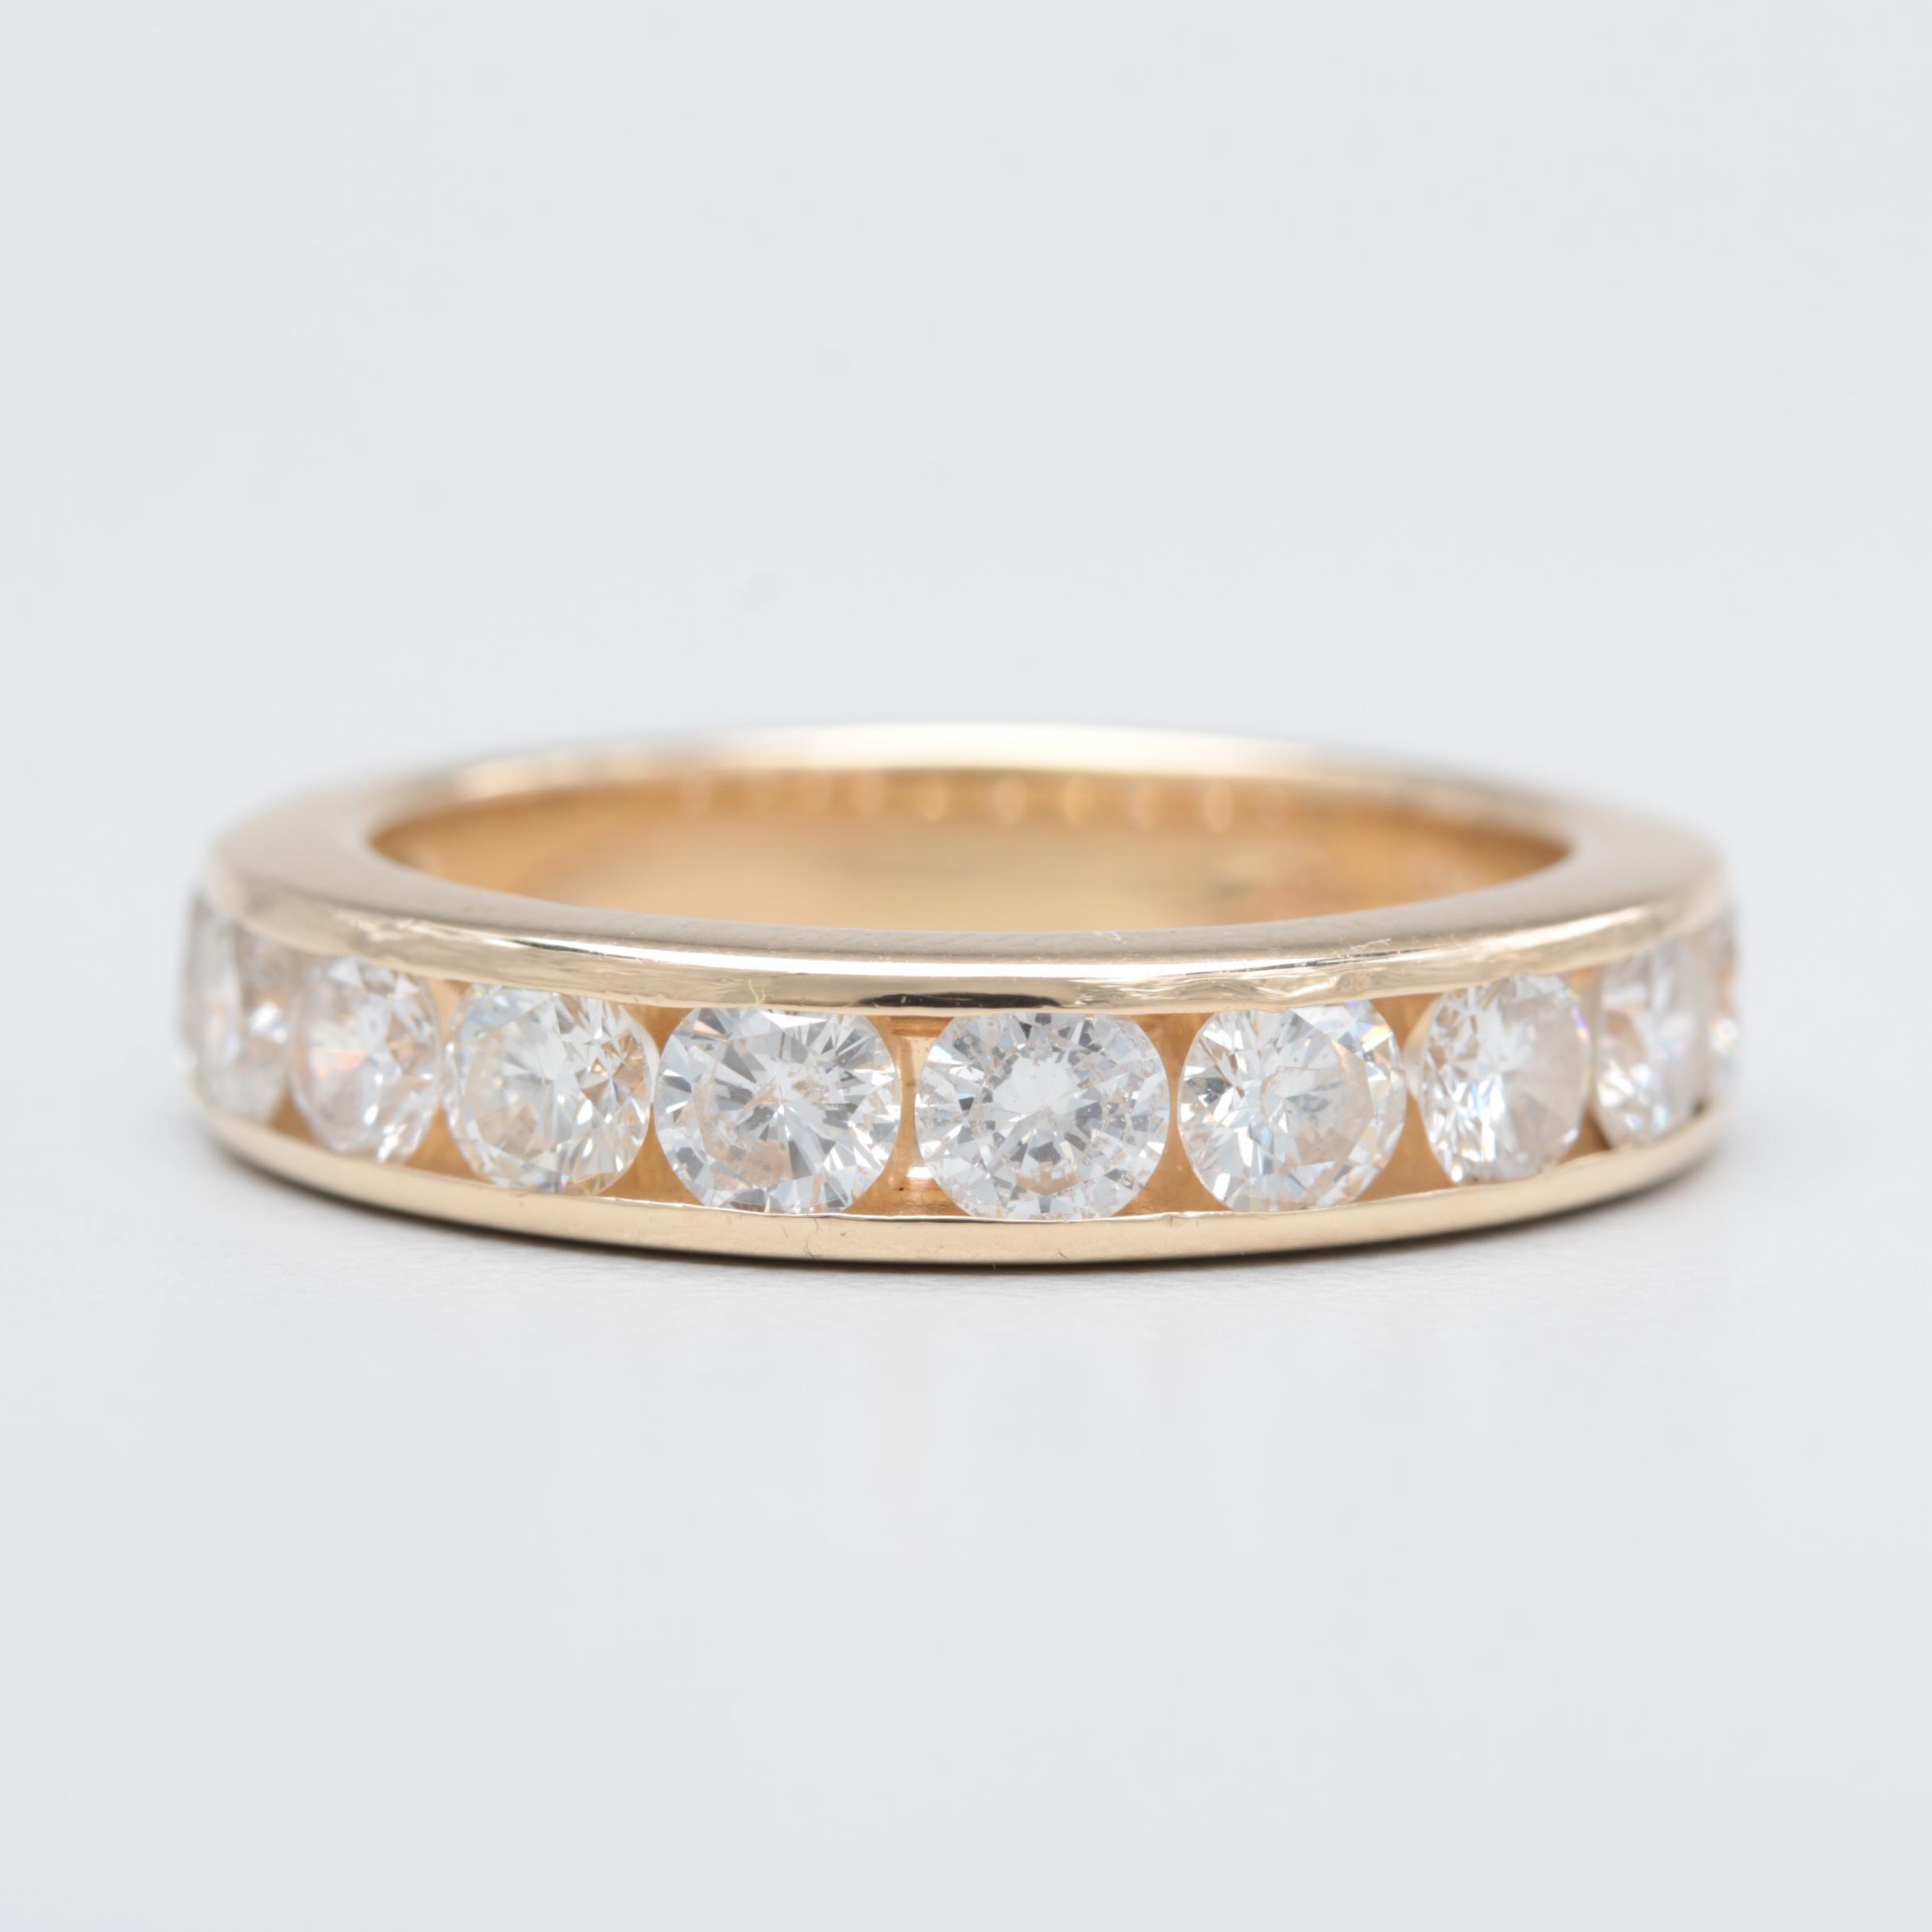 14K Yellow Gold 1.98 CTW Diamond Ring